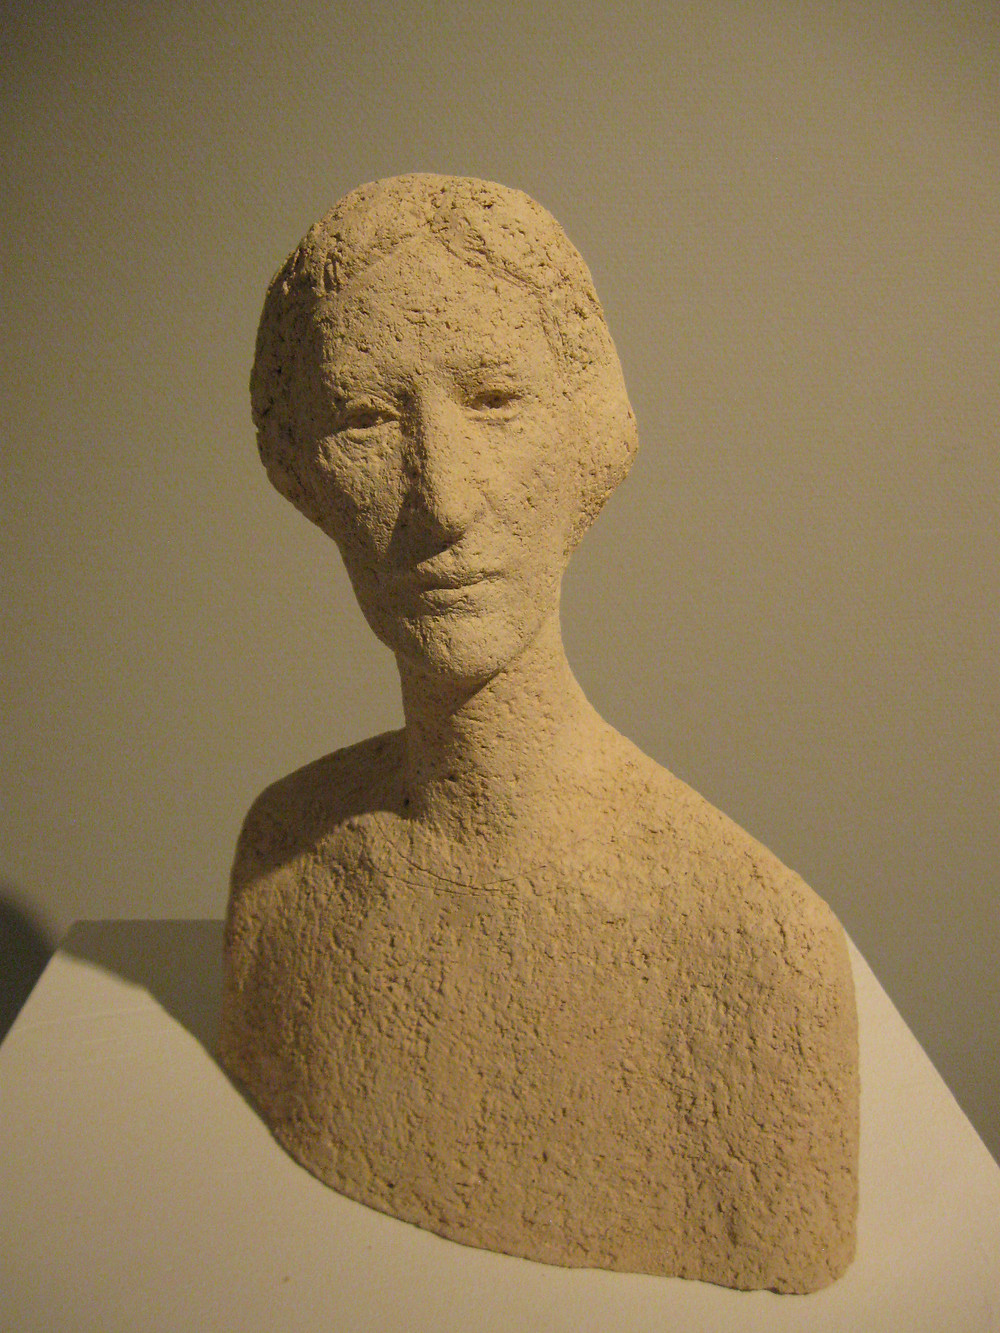 Gvárdián Ferenc: Simone Weil